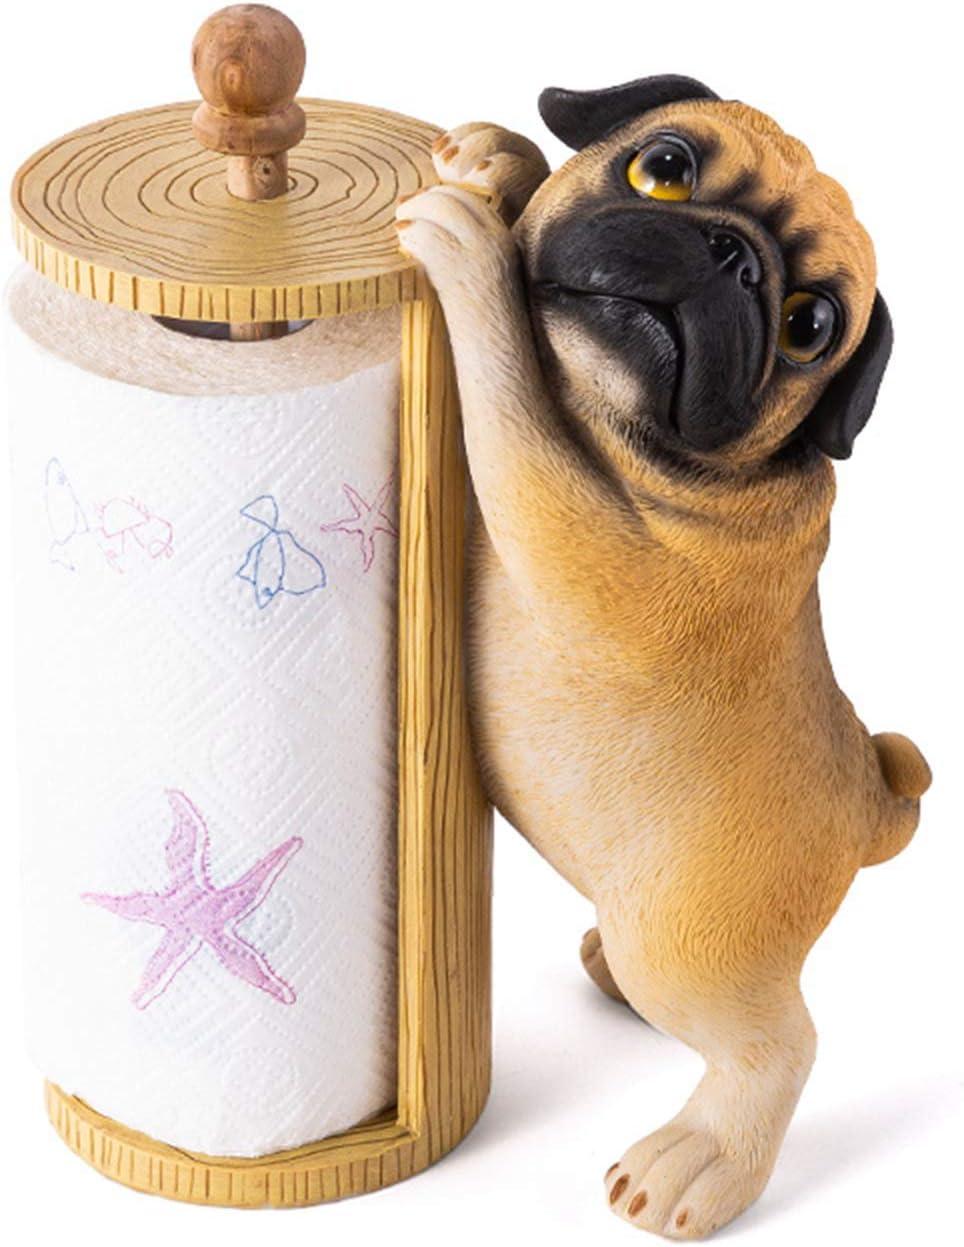 Kitchen Roll Holder Creative Ranking 2021 model TOP14 Dog Modeling Resin Towel Paper Hol